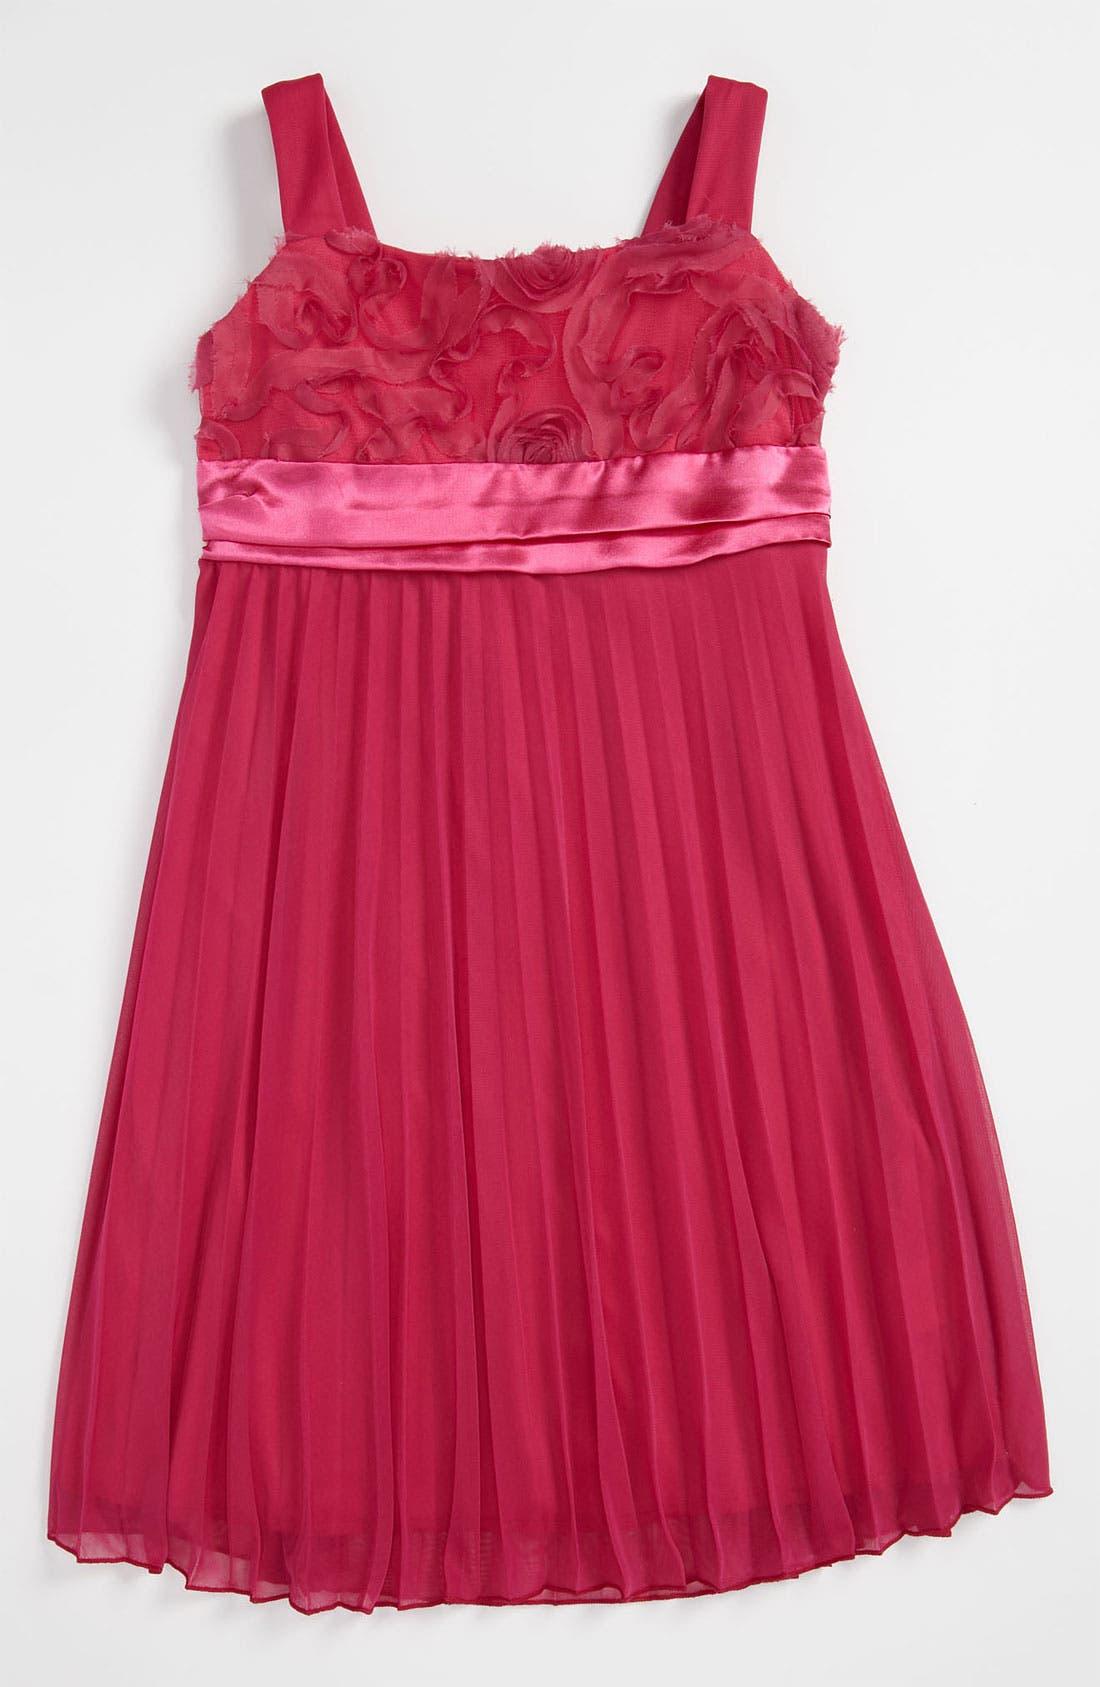 Main Image - Roxette Soutache Pleated Dress (Little Girls & Big Girls)